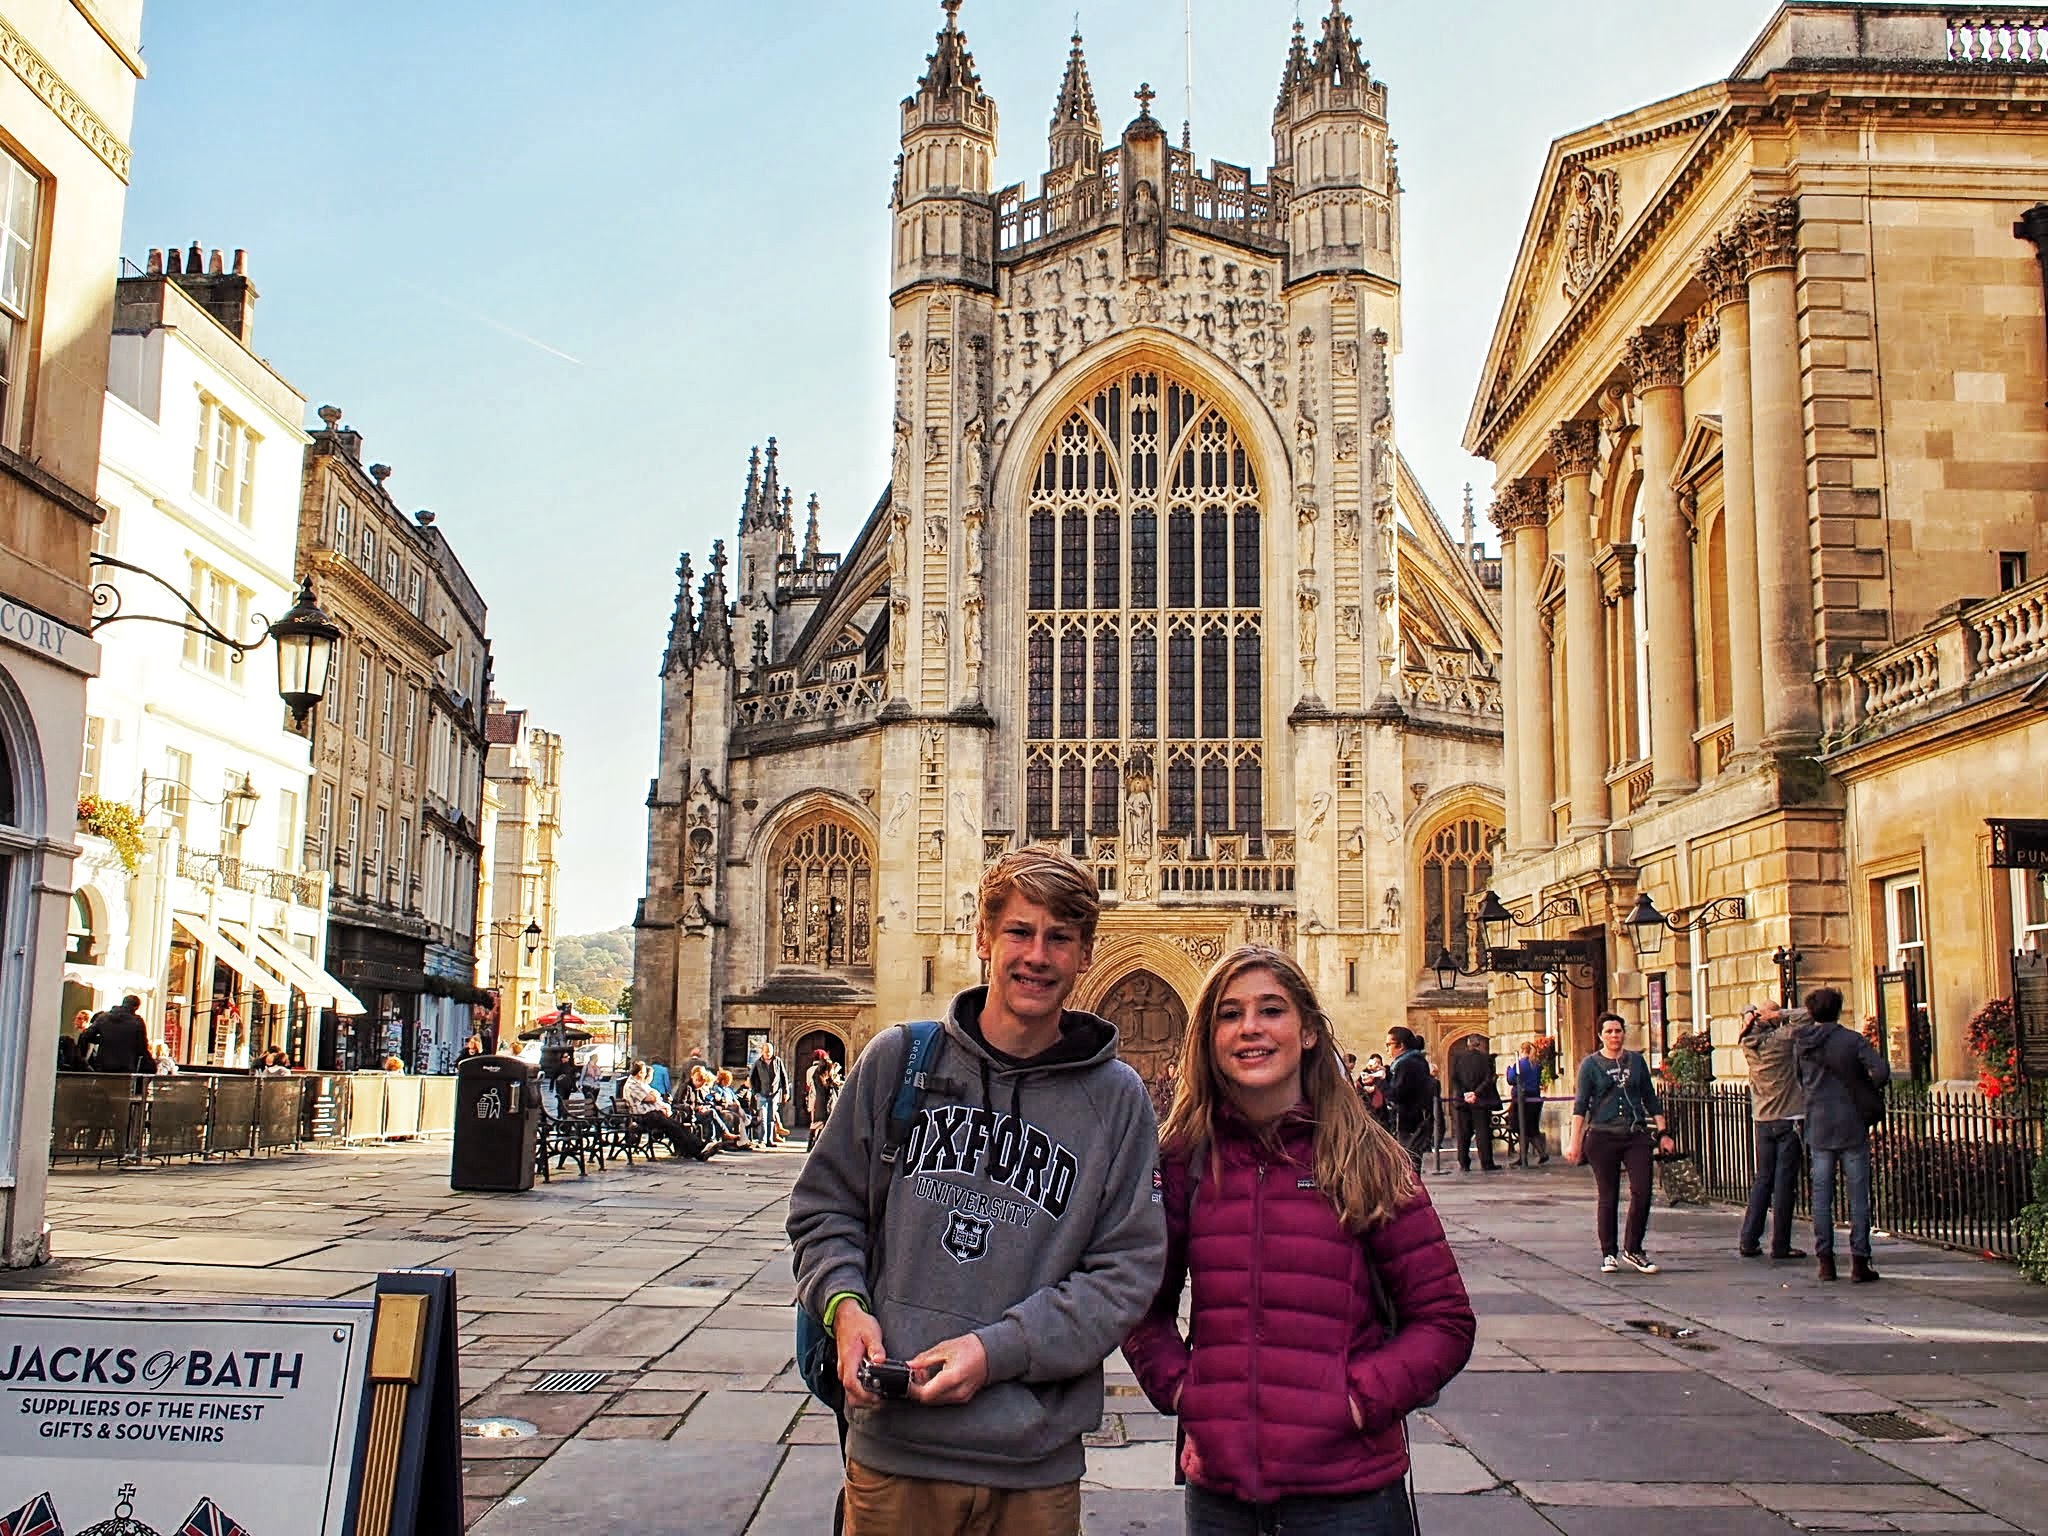 Bath - great free walking tour